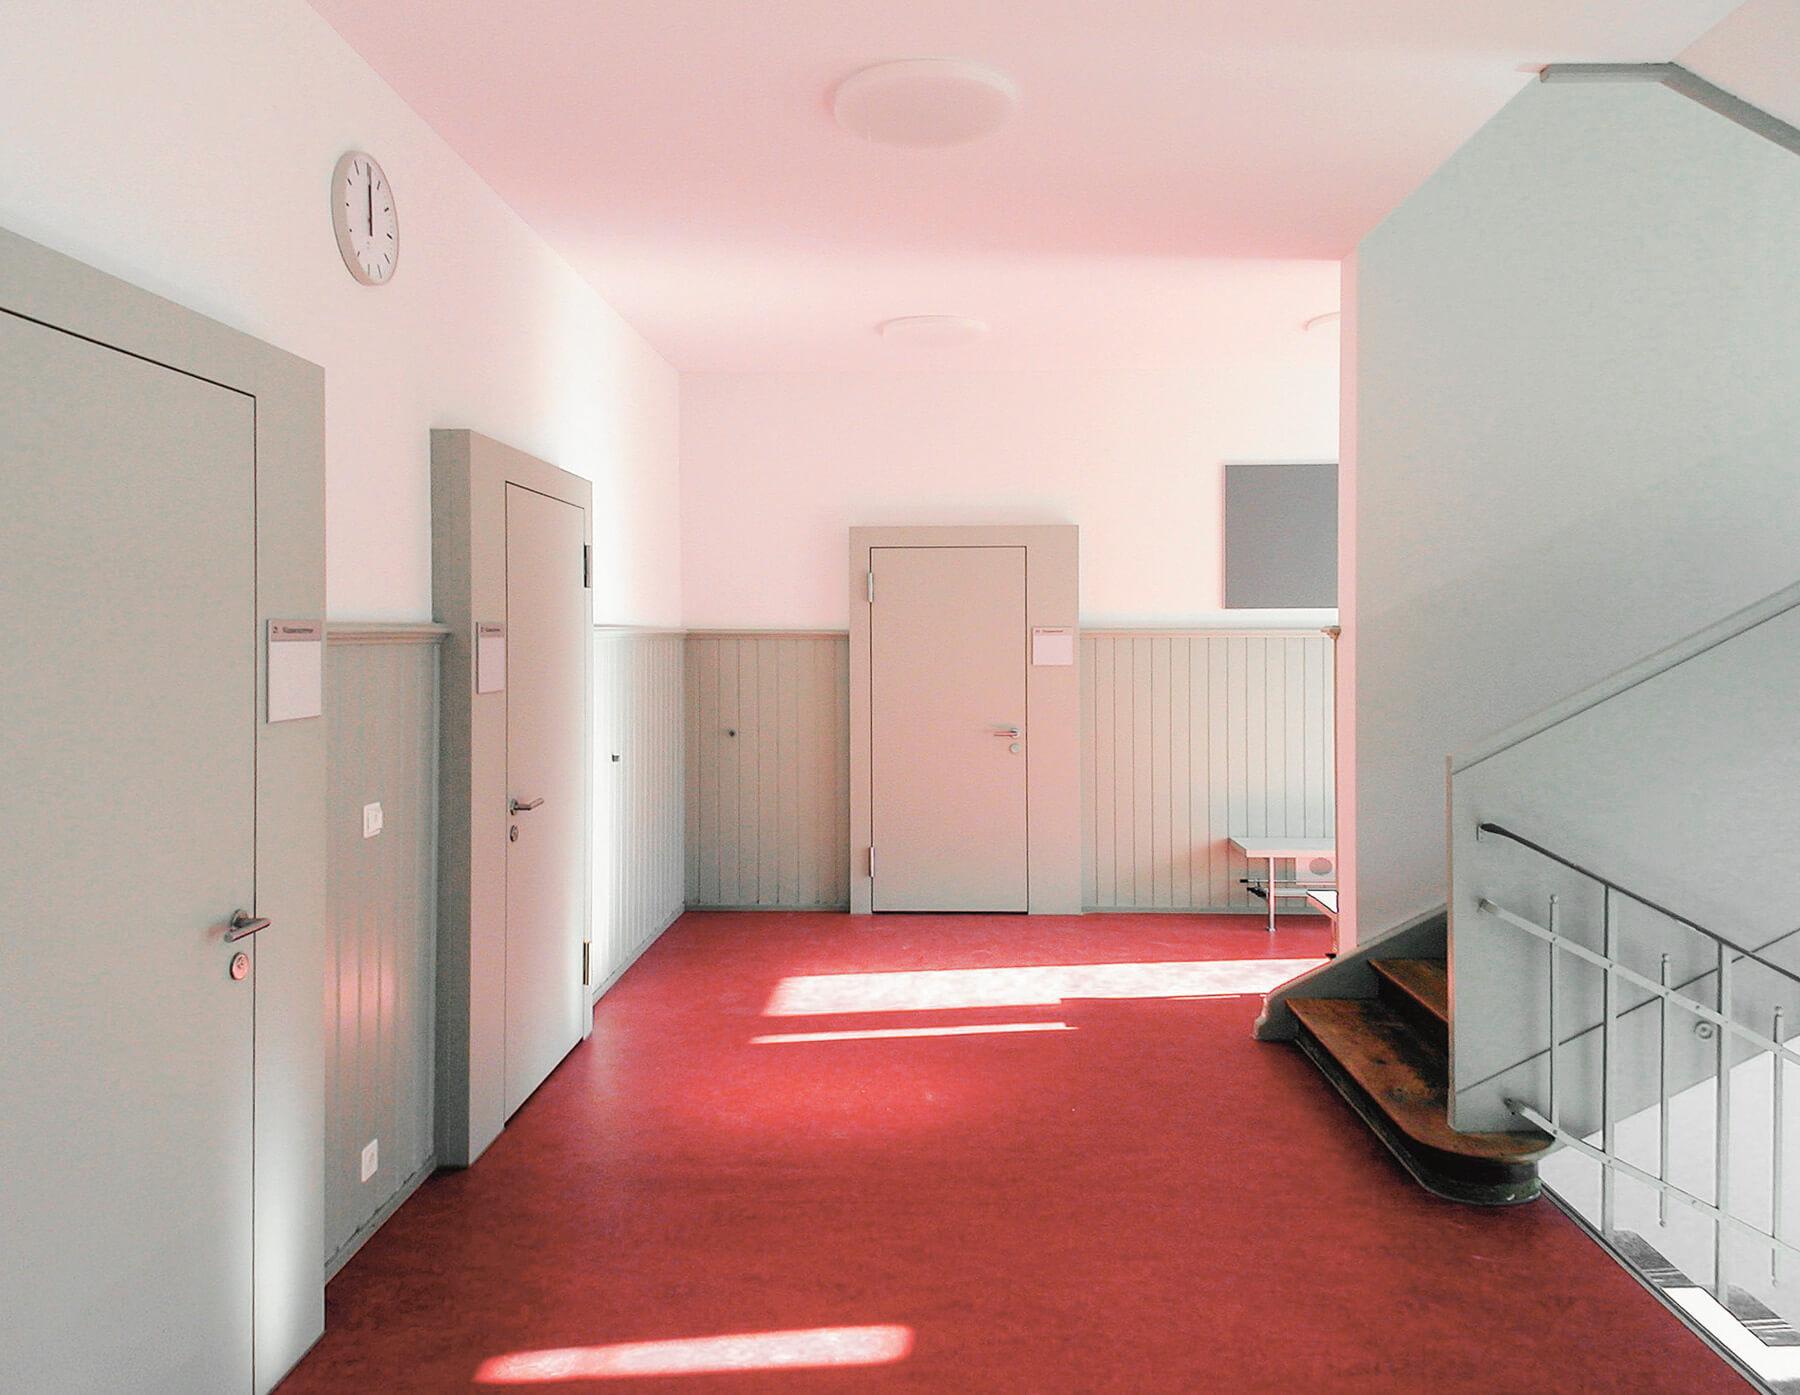 schulhaus-masans-treppenhaus